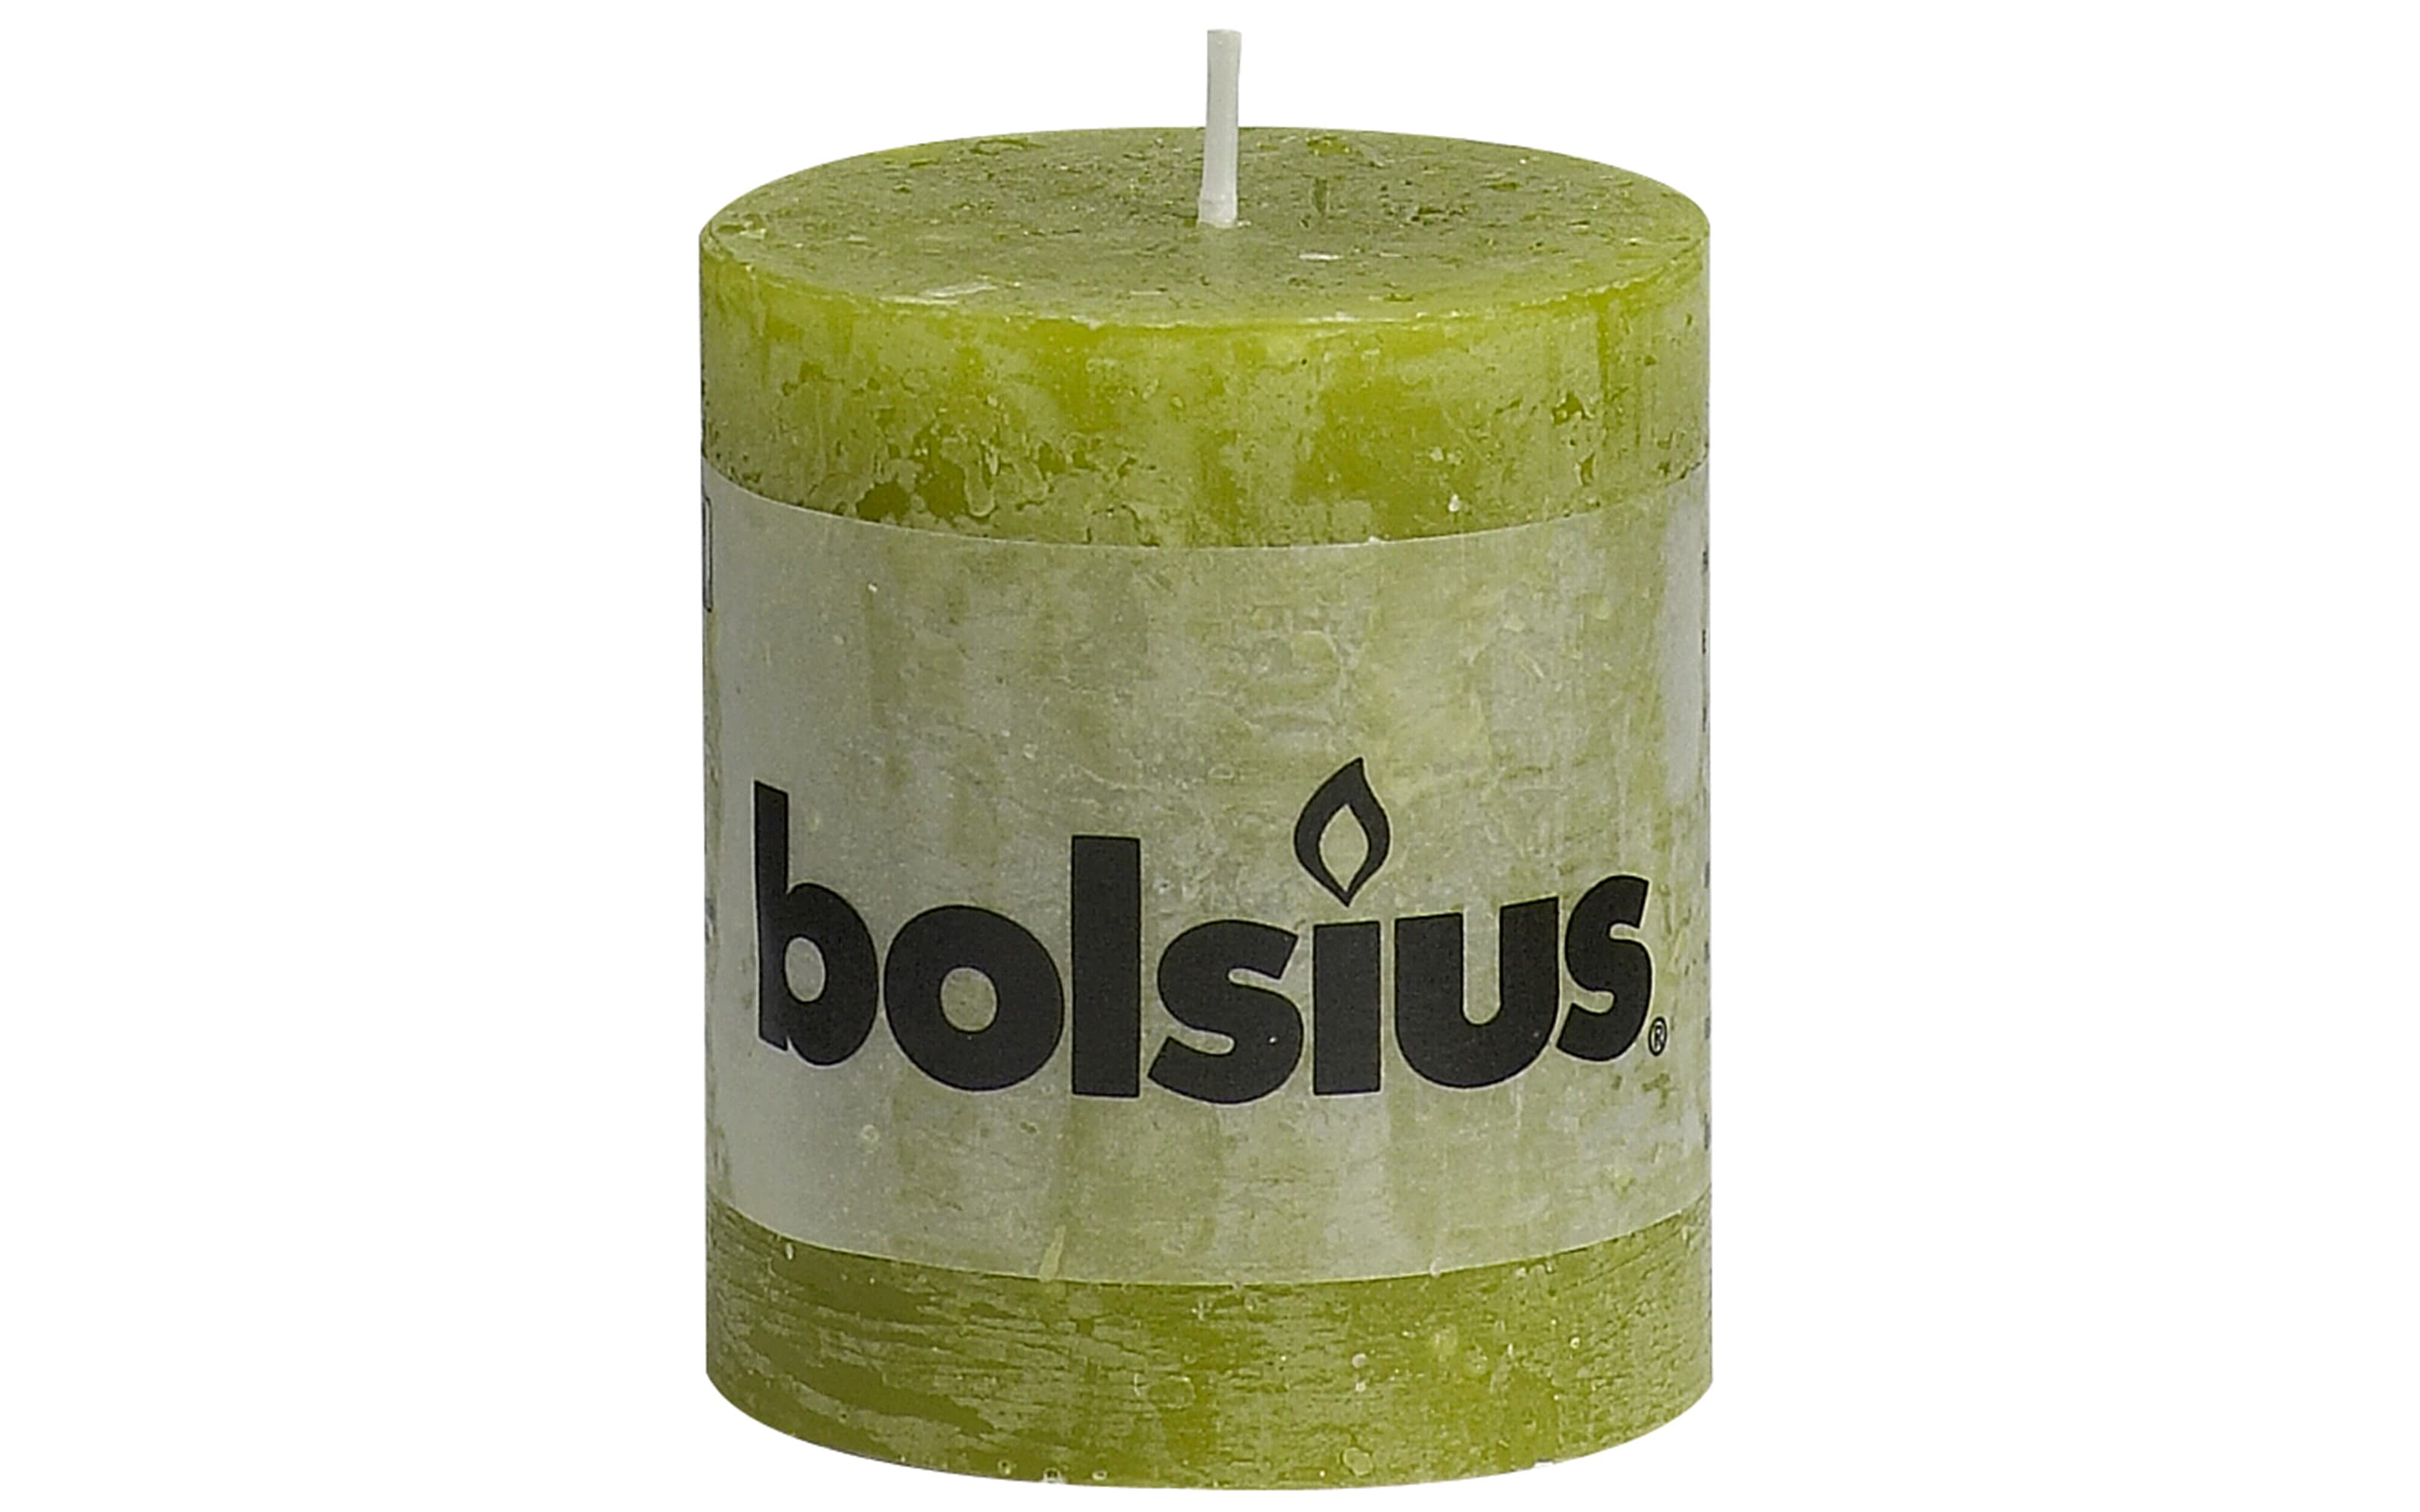 Stumpenkerze Rustik in moosgrün, 8 cm